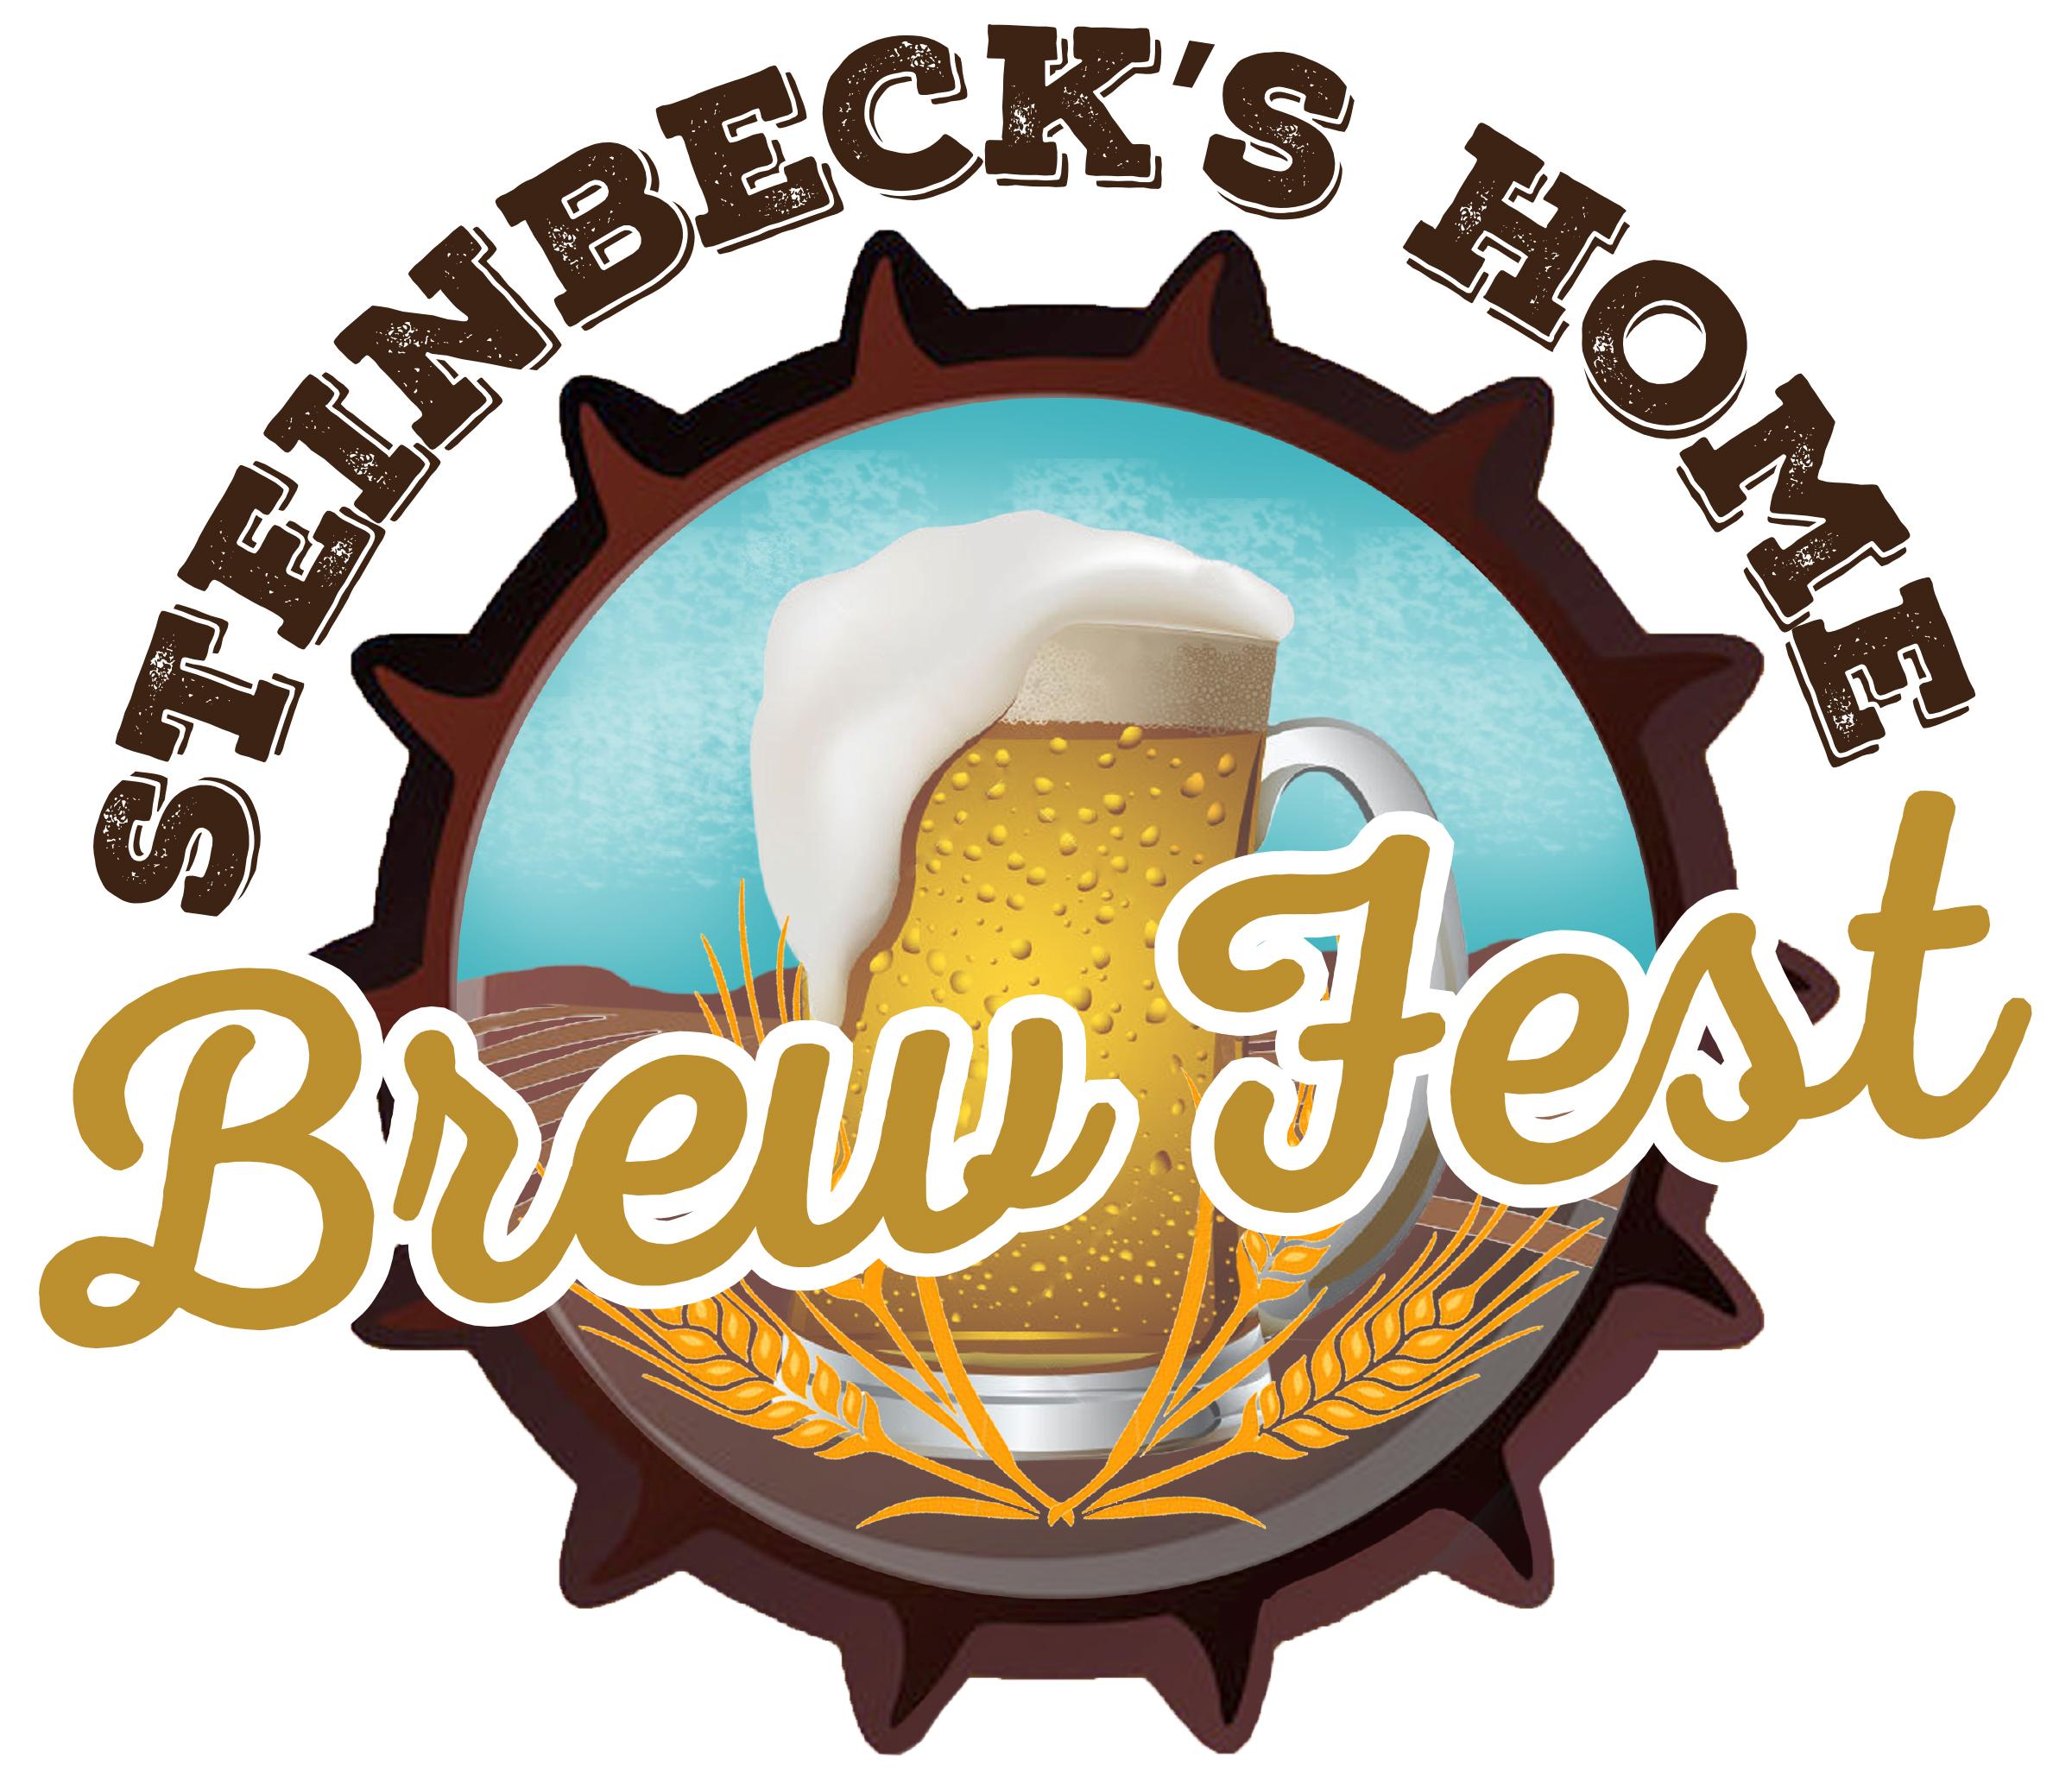 Copy of BrewFest-2016logo.jpg